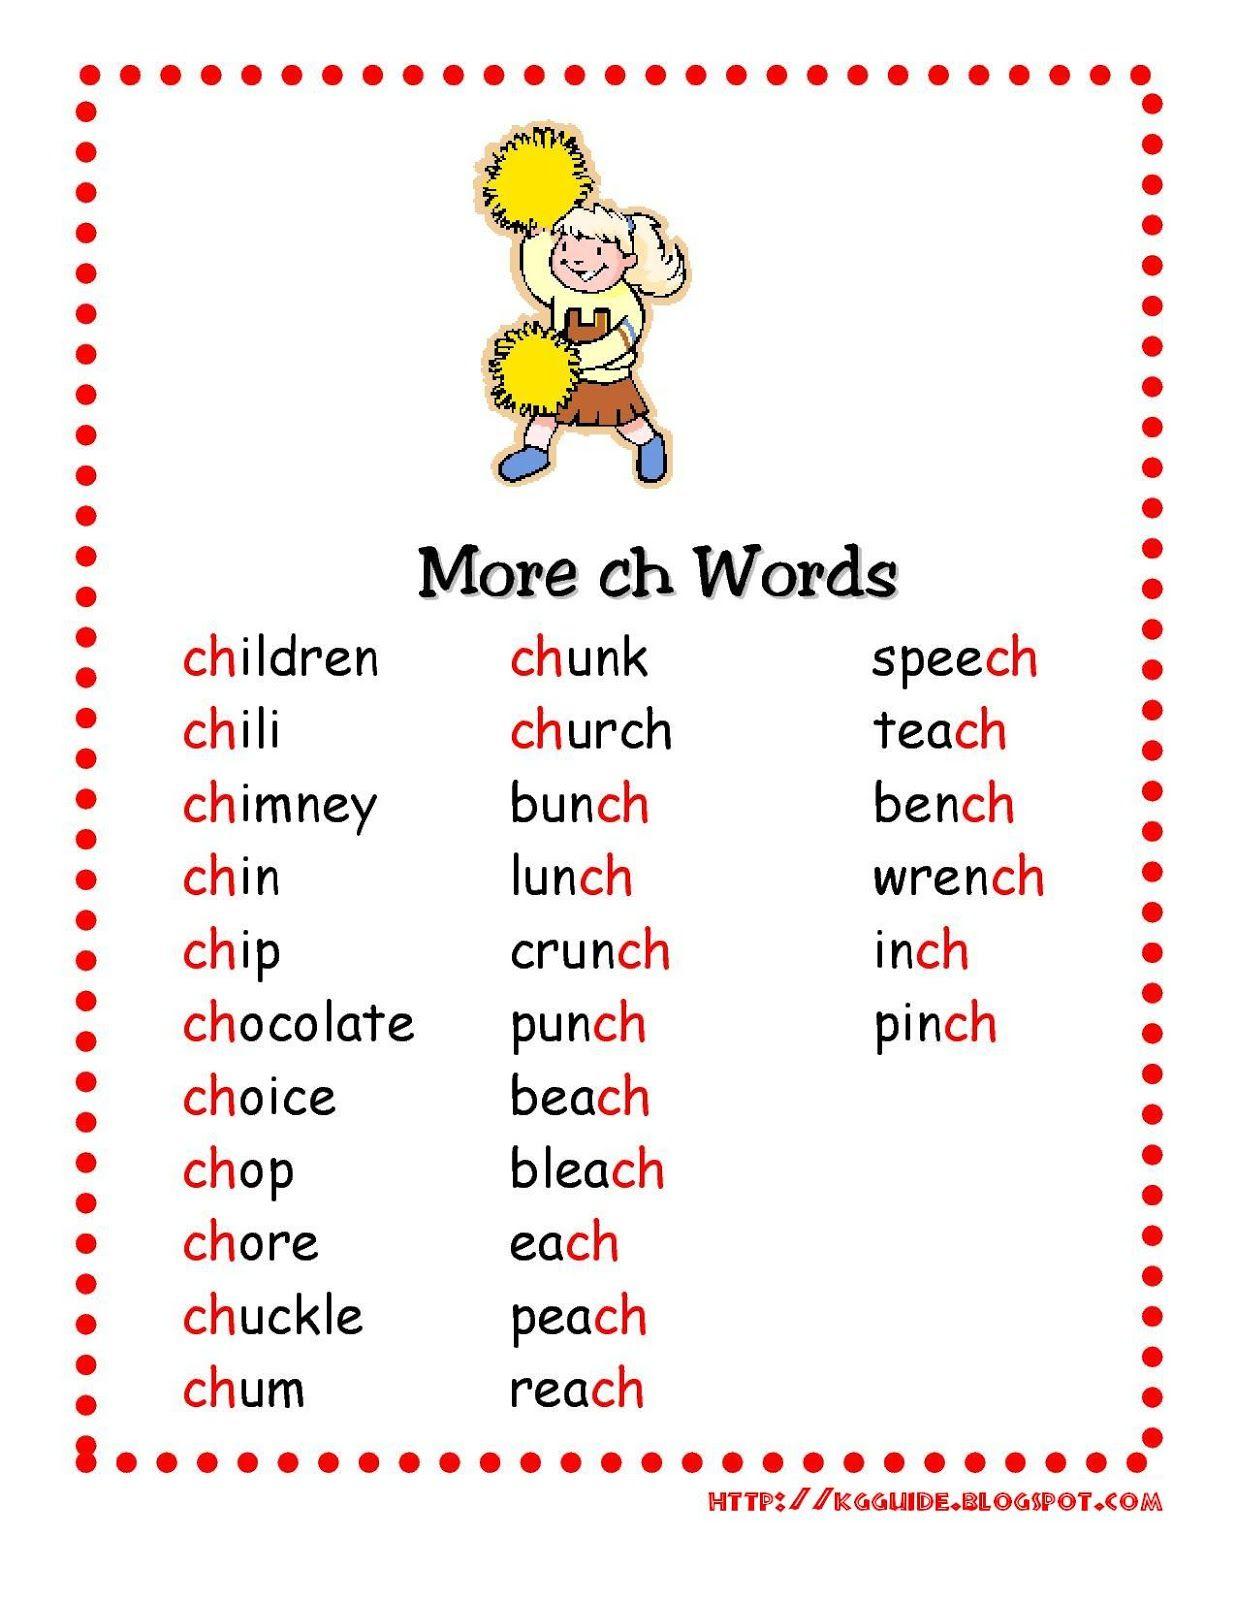 worksheet Trigraph Worksheets and worksheets on ch sh th blends digraphs trigraphs other letter range of